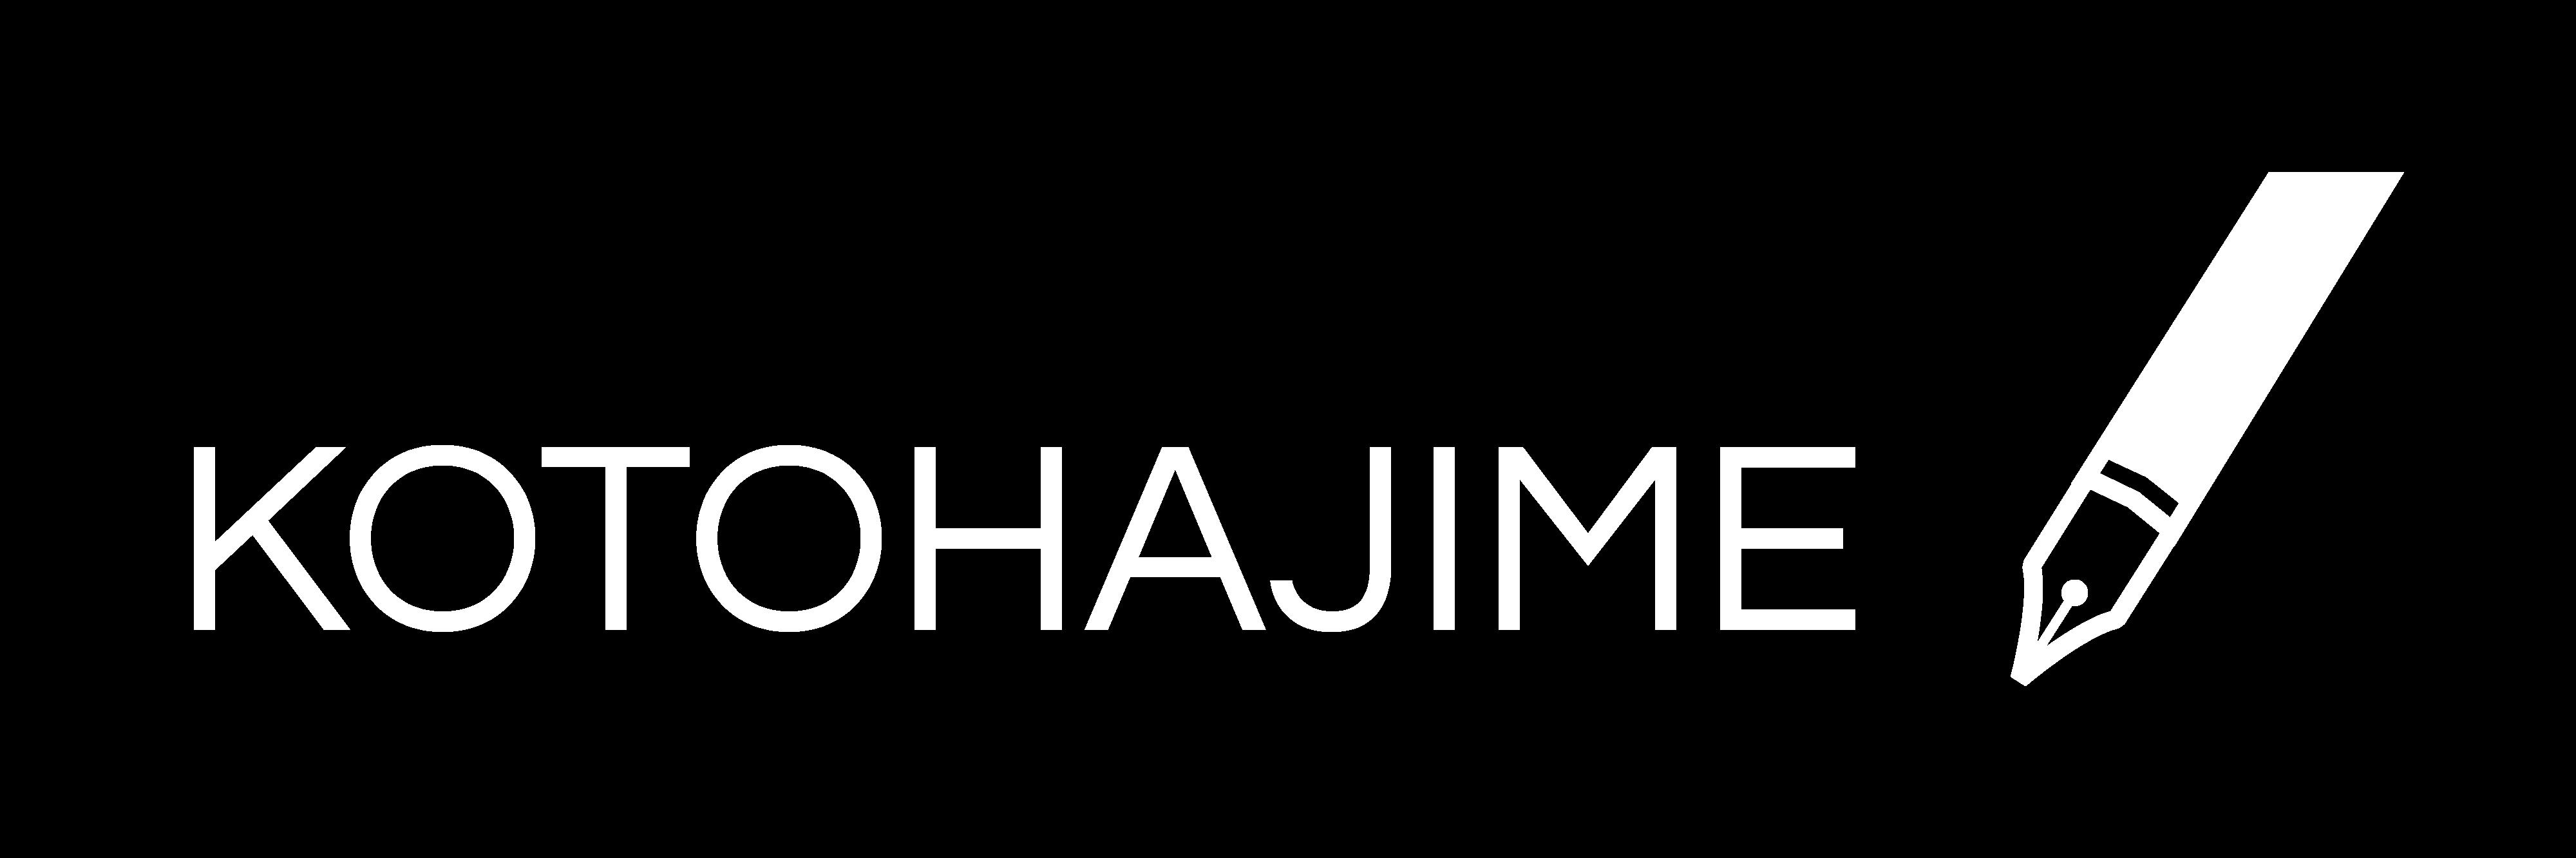 KOTOHAJIME